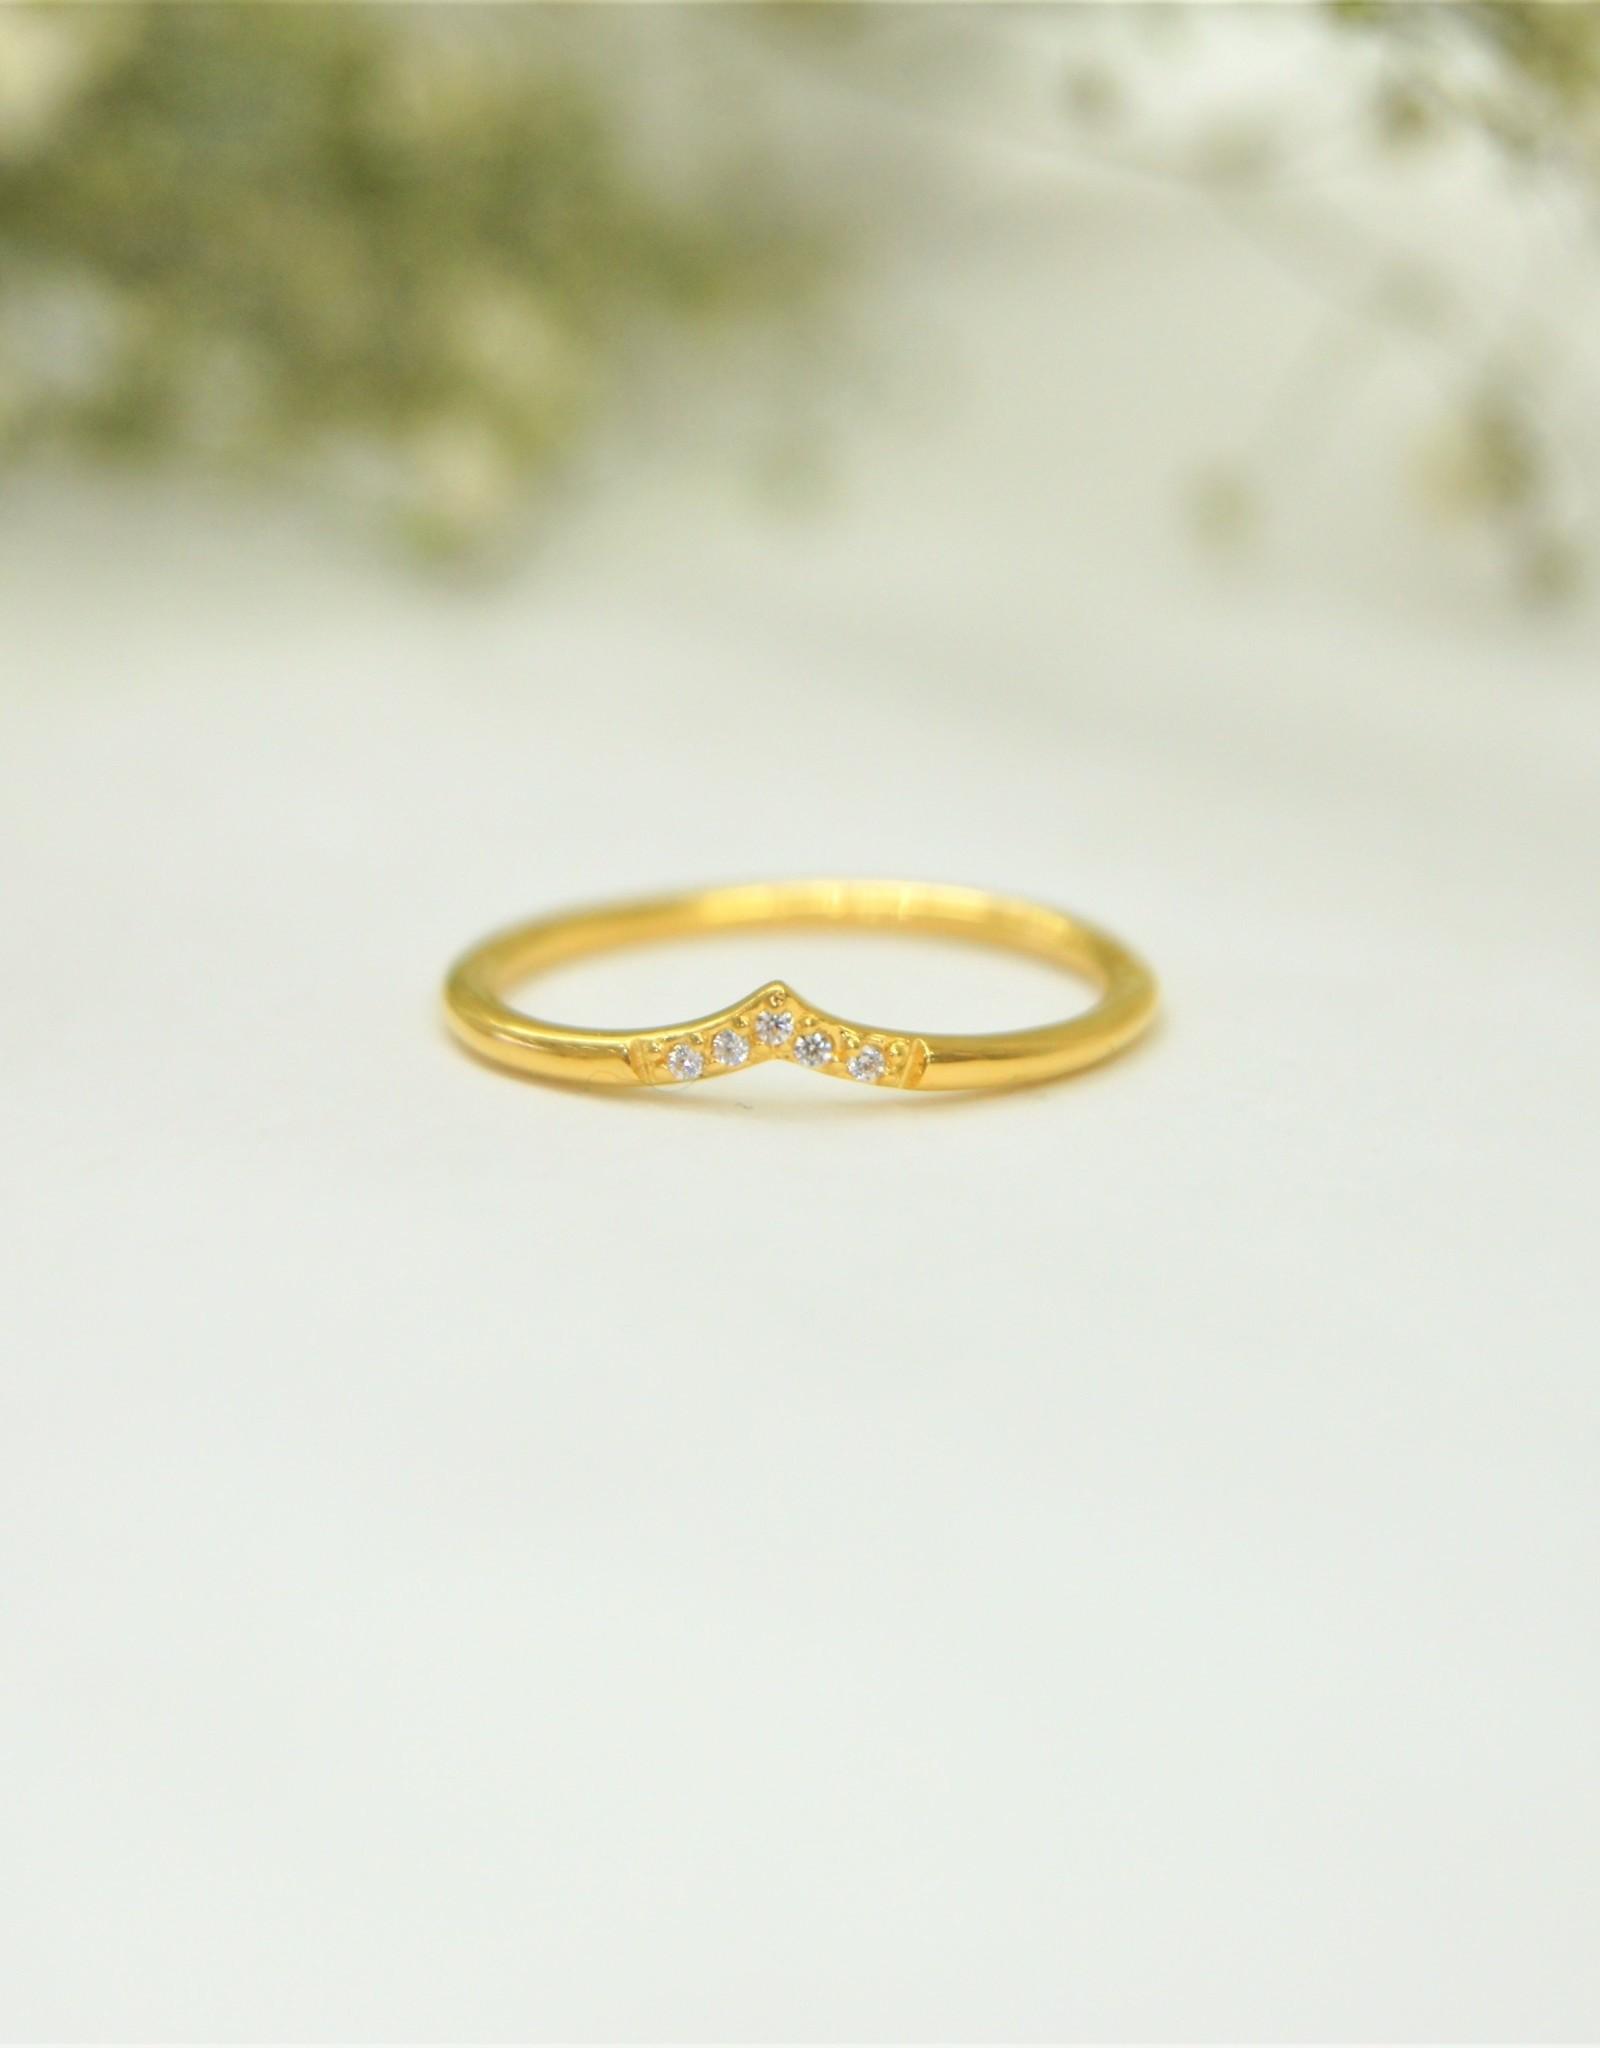 Tashi Chevron Ring With Cubic Zirconia - Gold Vermeil